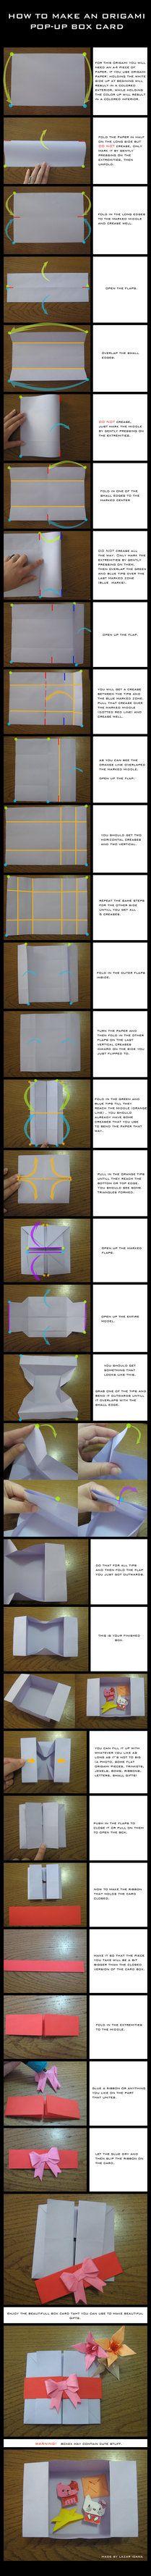 Caixa envelopeCaixa Envelopes, Crafts Ideas, Origami Tutorials, Origami Boxes, Pop Up Boxes Envelopes, Origami Cards Tutorials, Envelopes Cards, Boxes Cards, Origami Pop Up